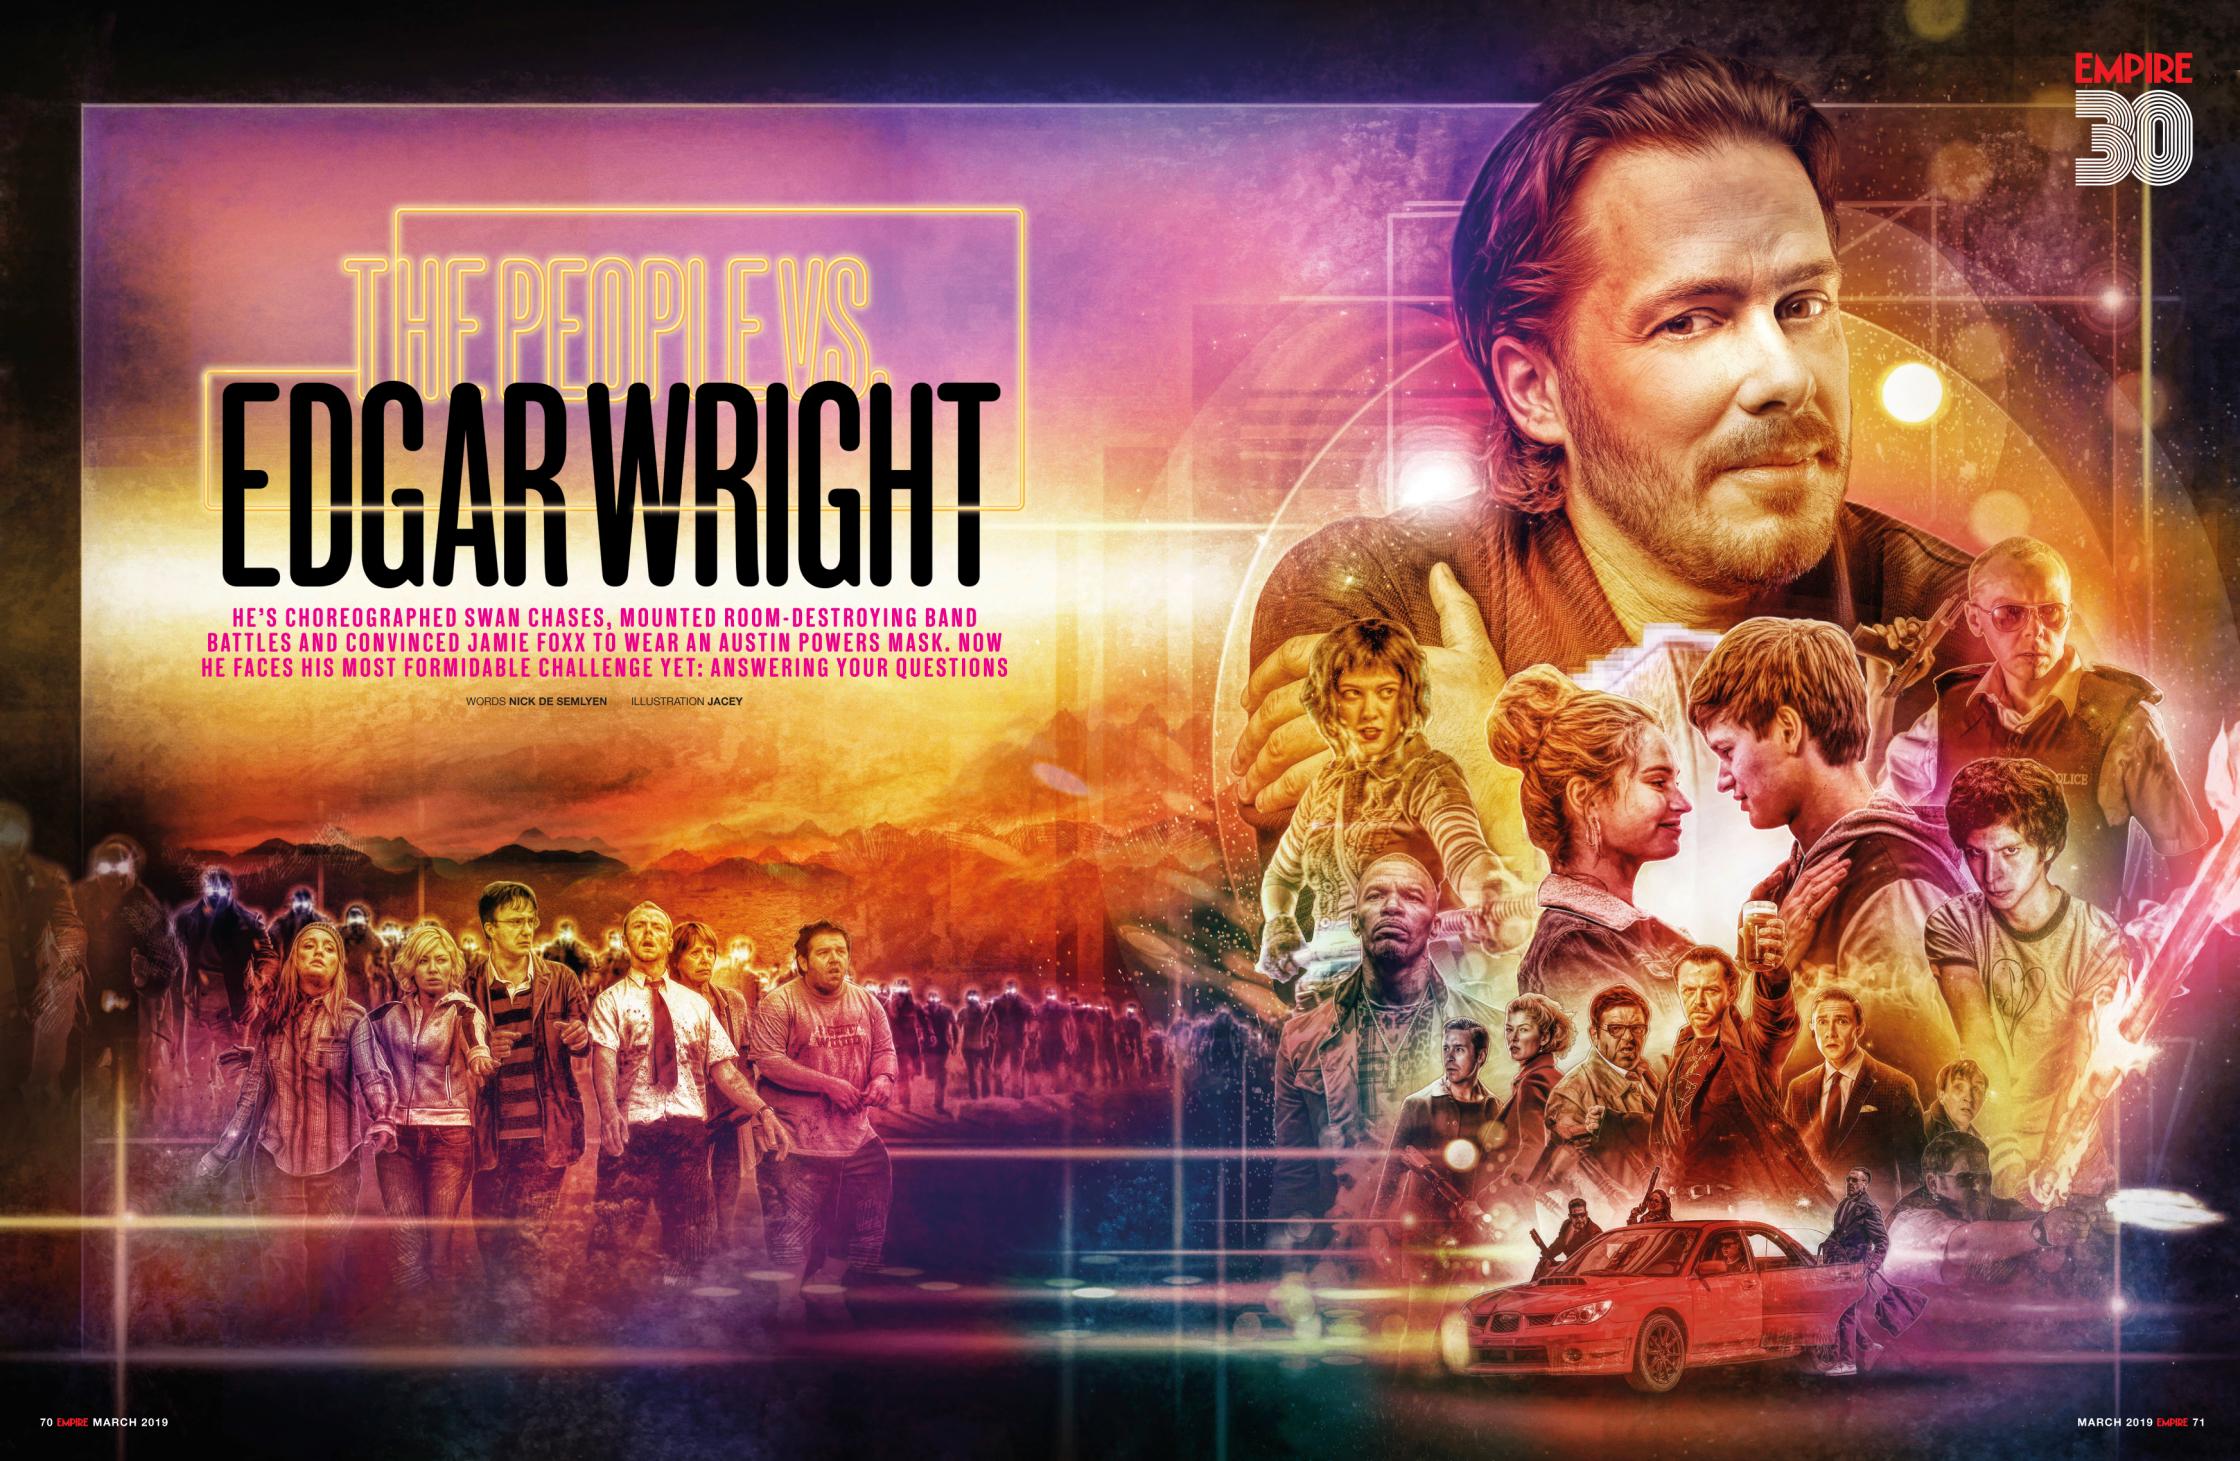 G02 30th Anniversary Edgar Wright Reader Qs_RD-pdf-spread-1.jpg